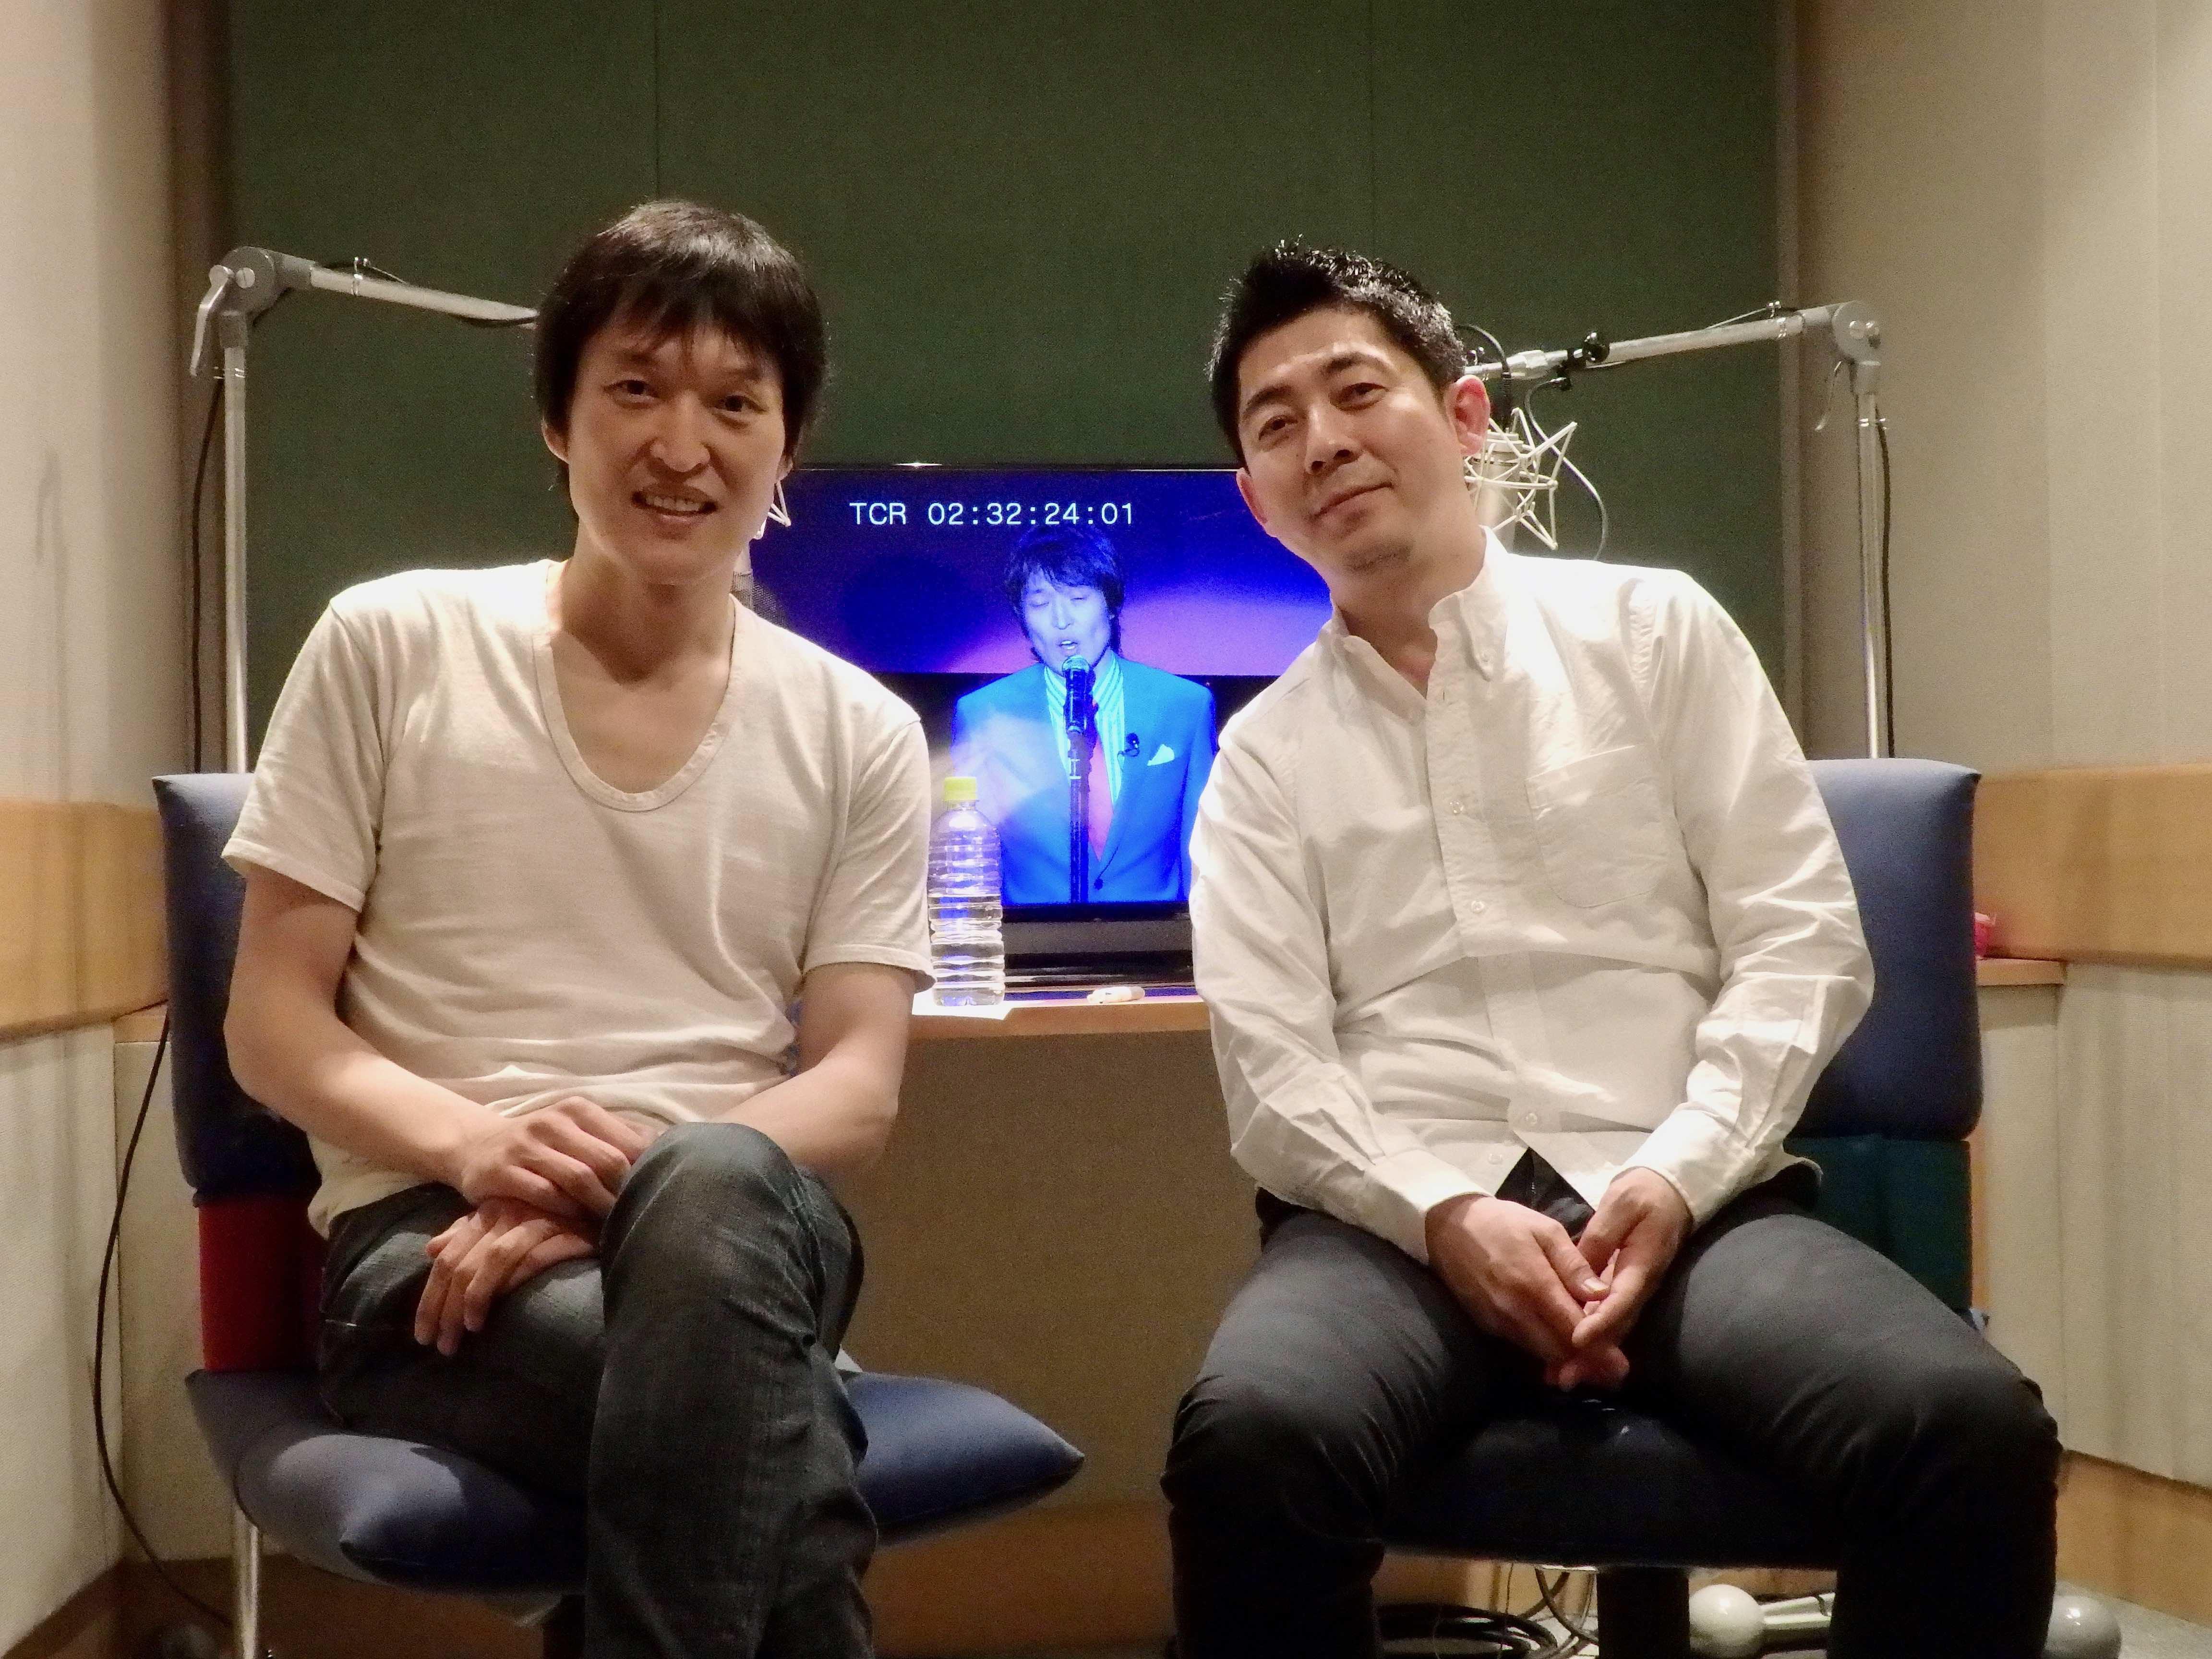 http://news.yoshimoto.co.jp/20170414171404-b86b9d5a9f65524aeaa671c5a120ceedefd149c9.jpg